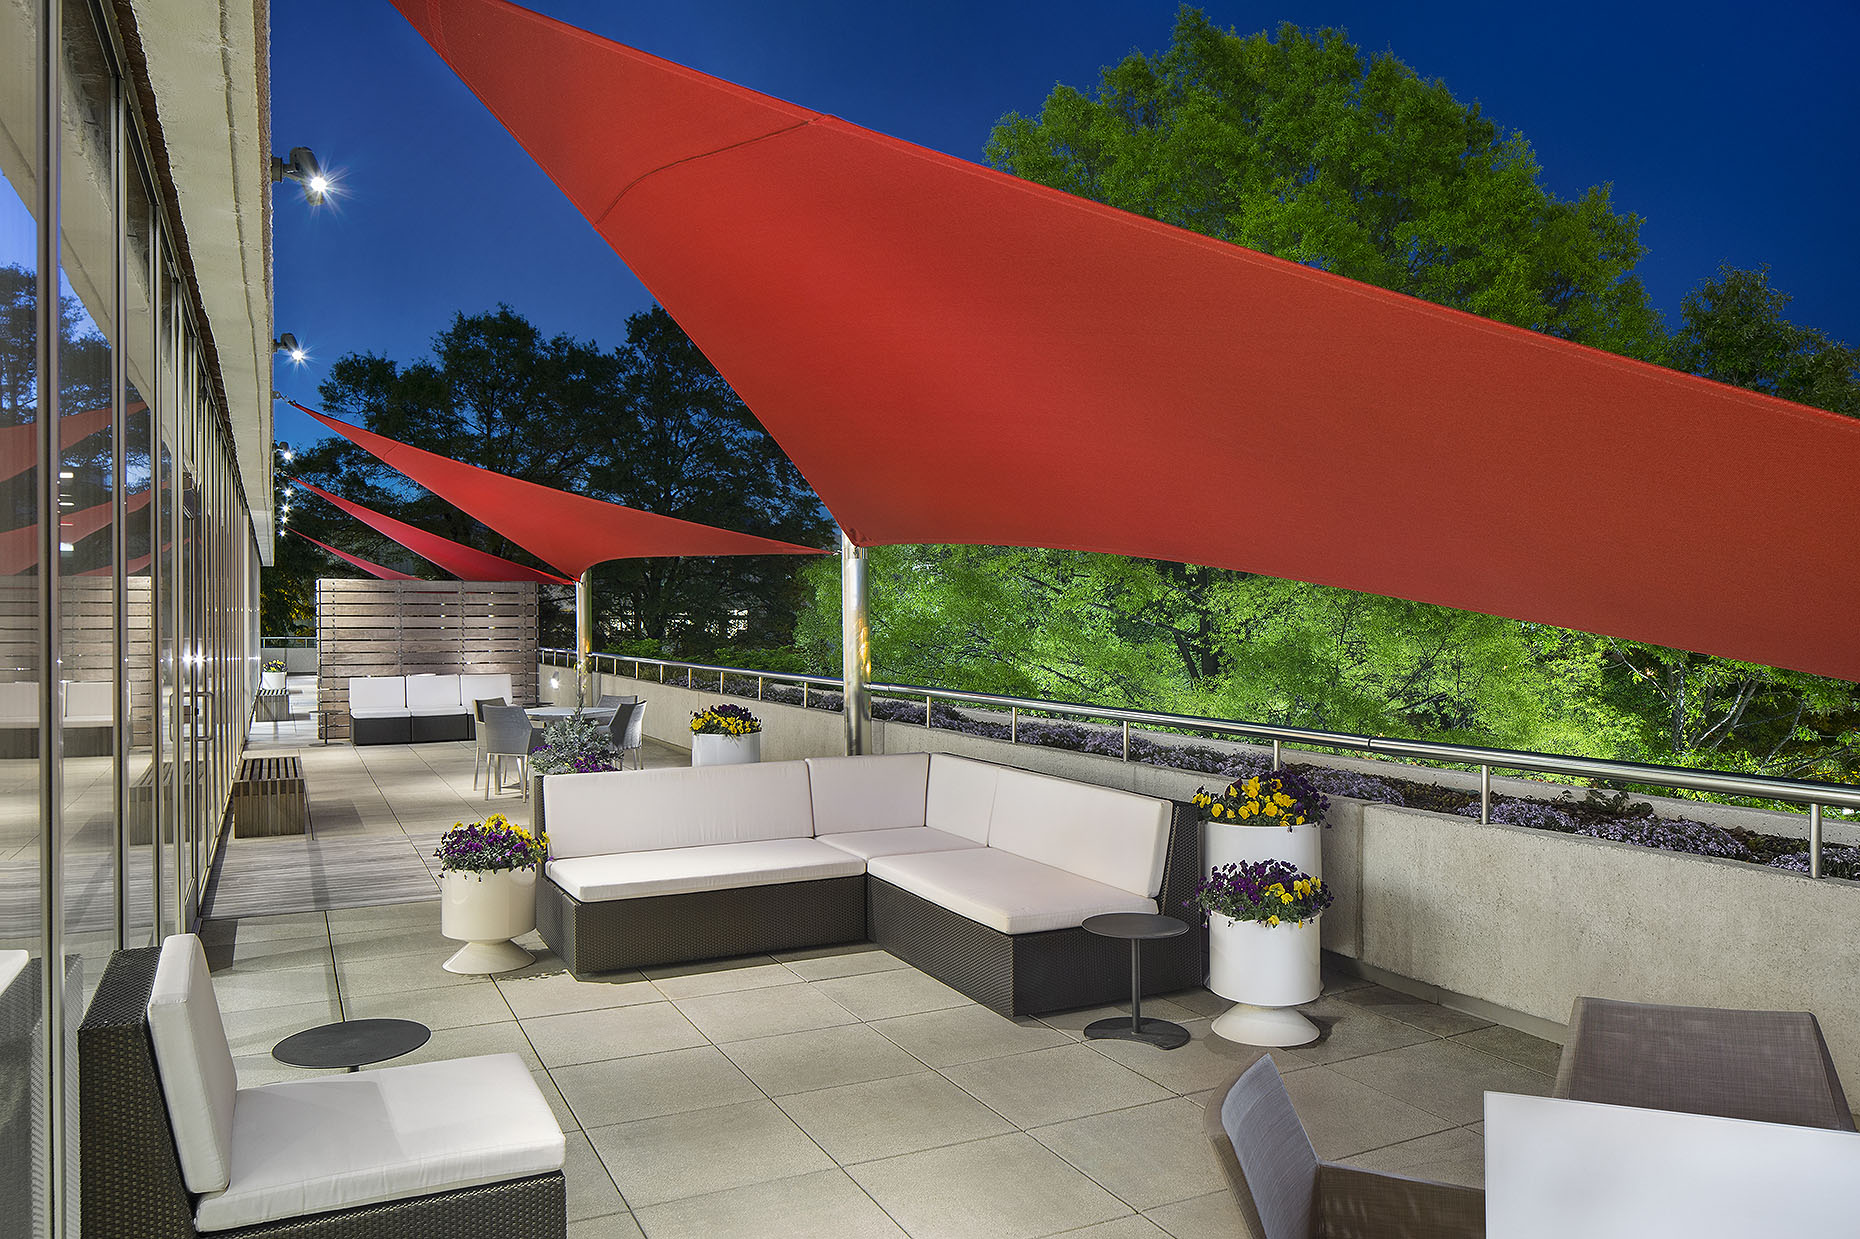 Commercial Space // Atlanta, GA // Client: IA - Interior Architects (Interior Design © IA - 2016)